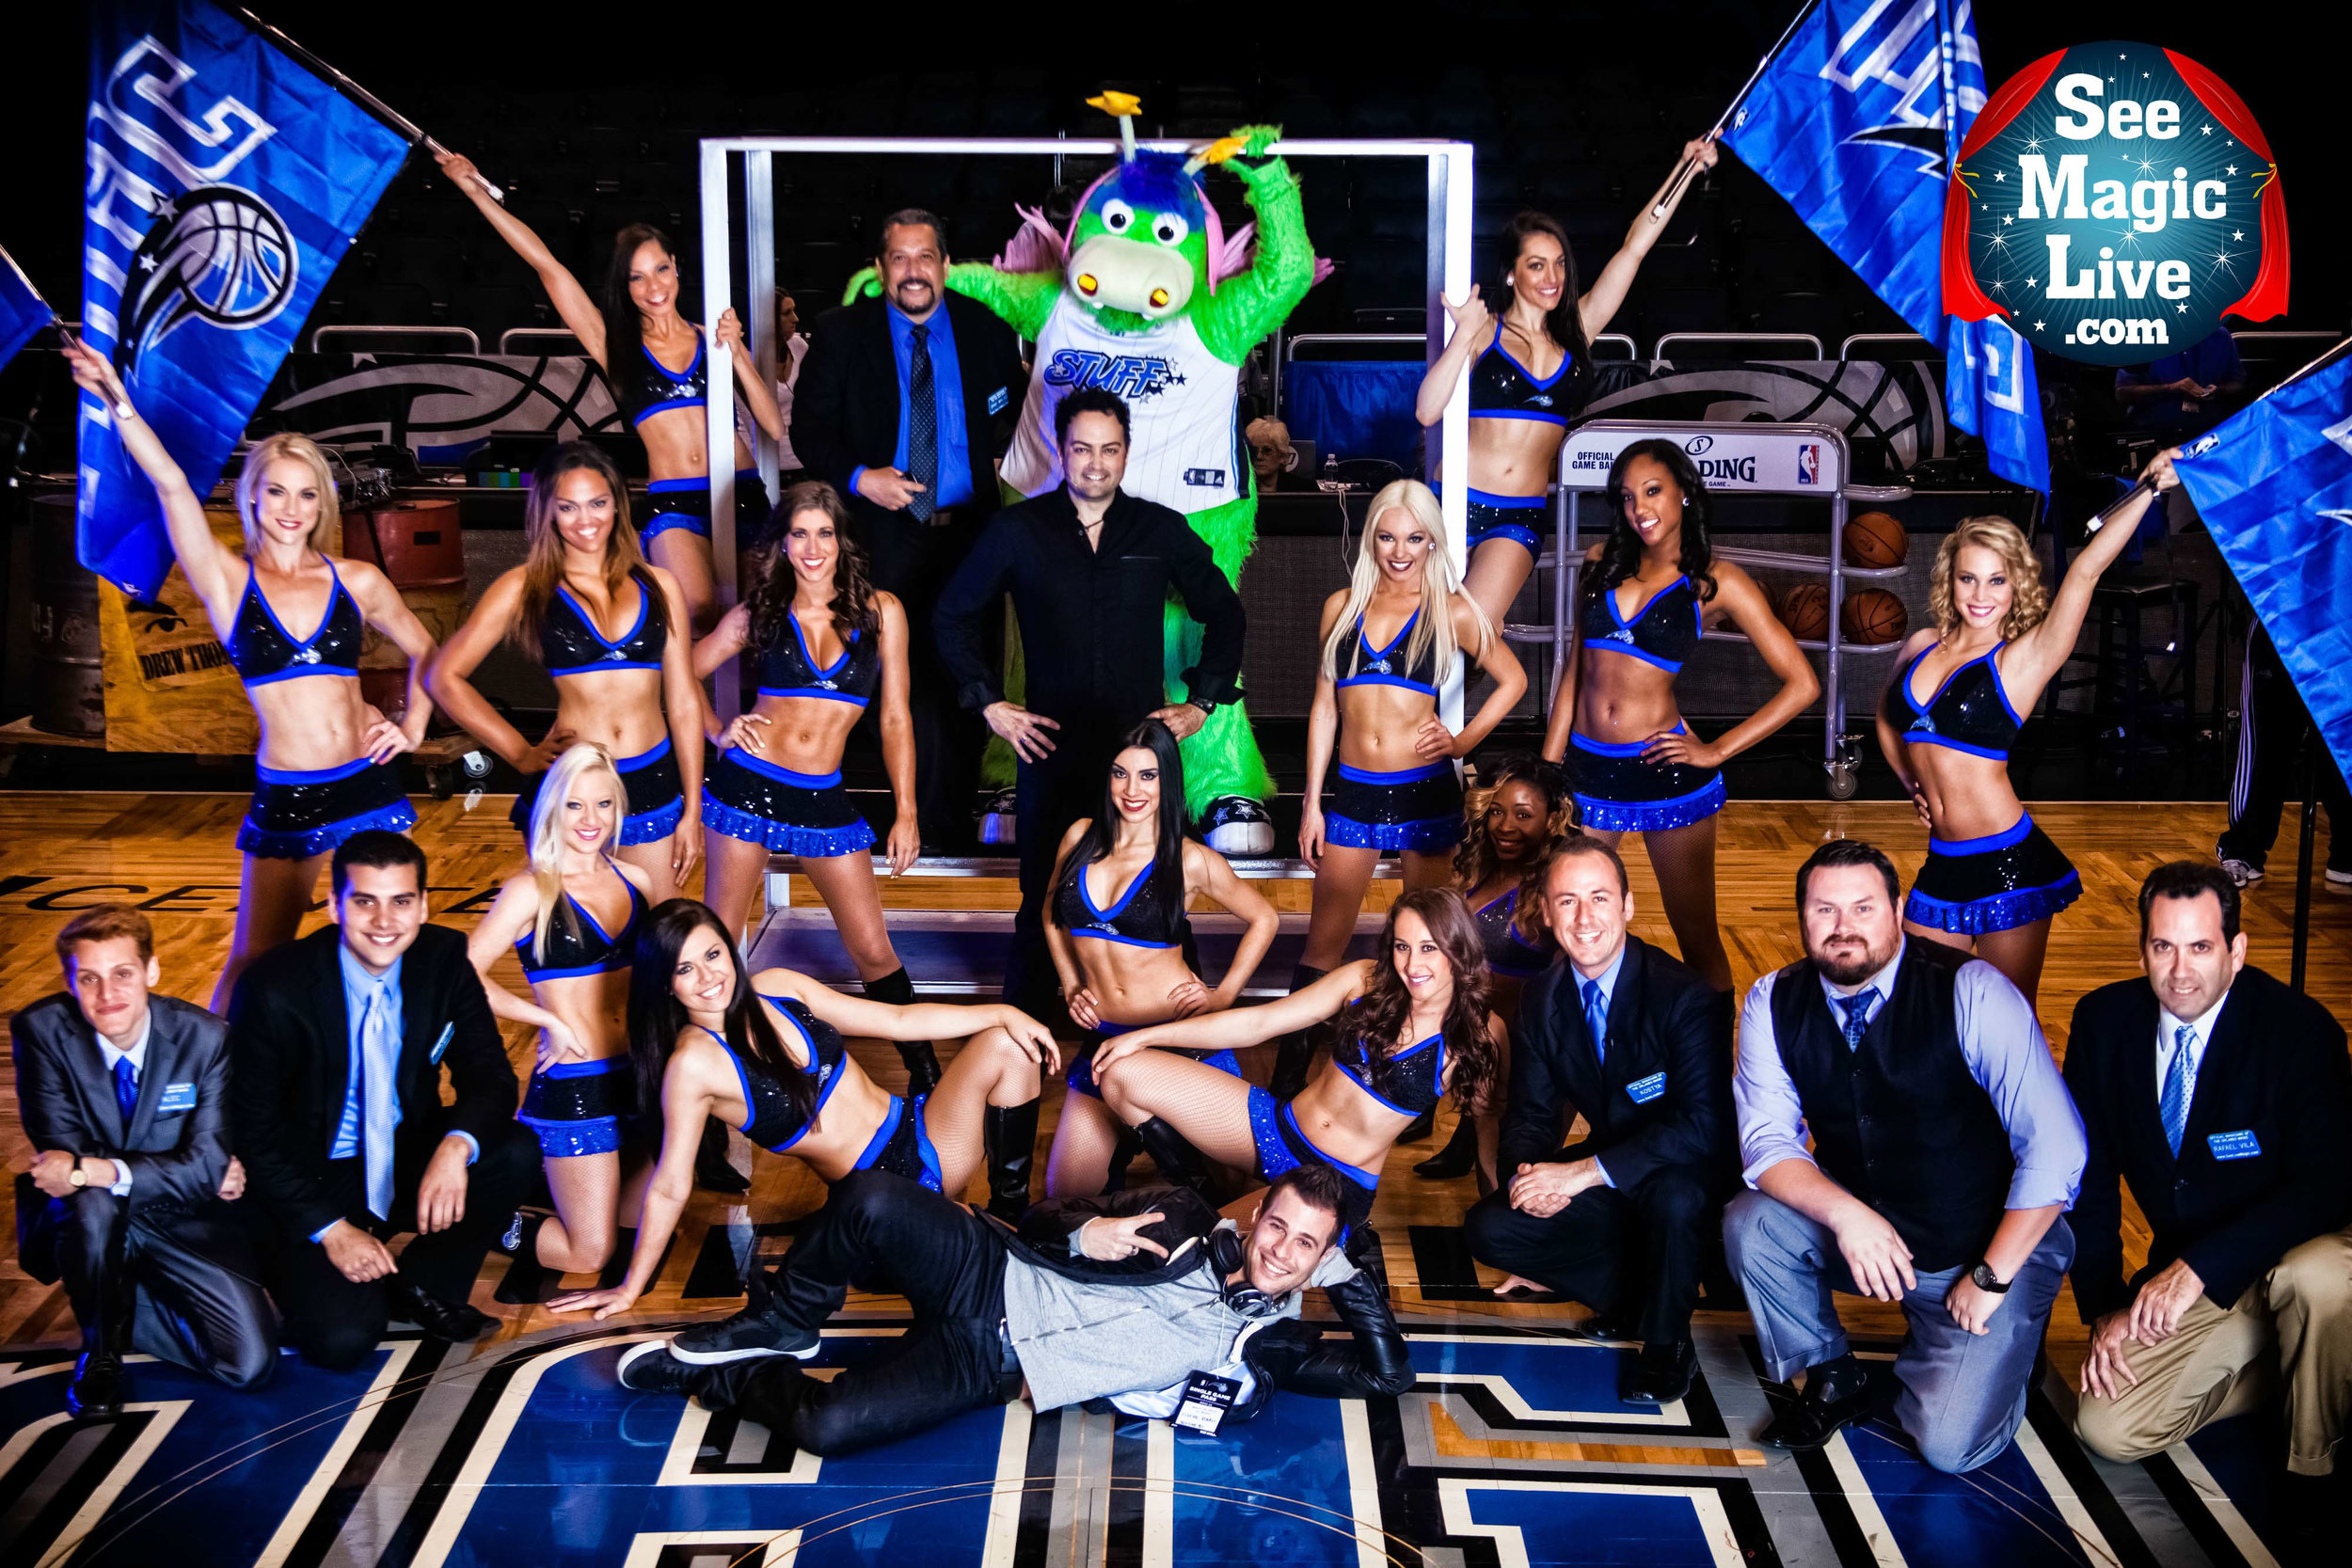 Kostya Kimlat's See Magic Live provides the magicians for the Orlando Magic